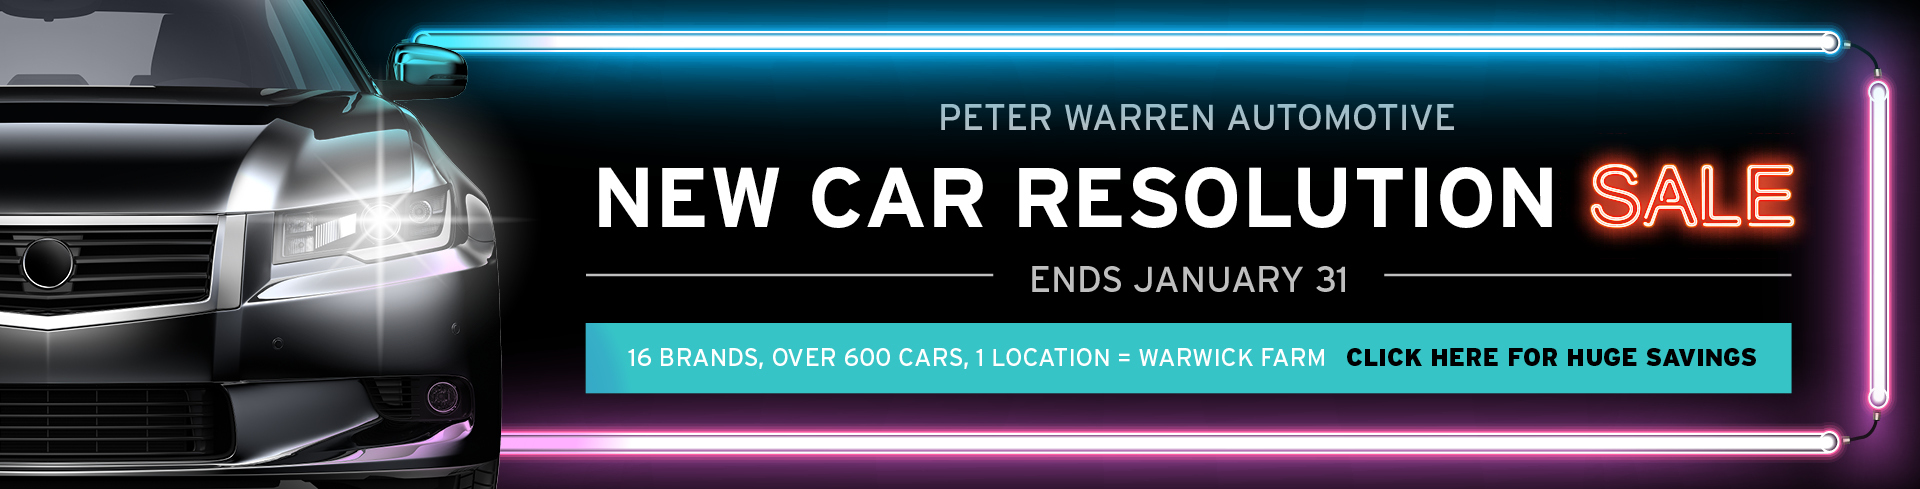 Peter Warren Automotive - New Car Resolution Sale